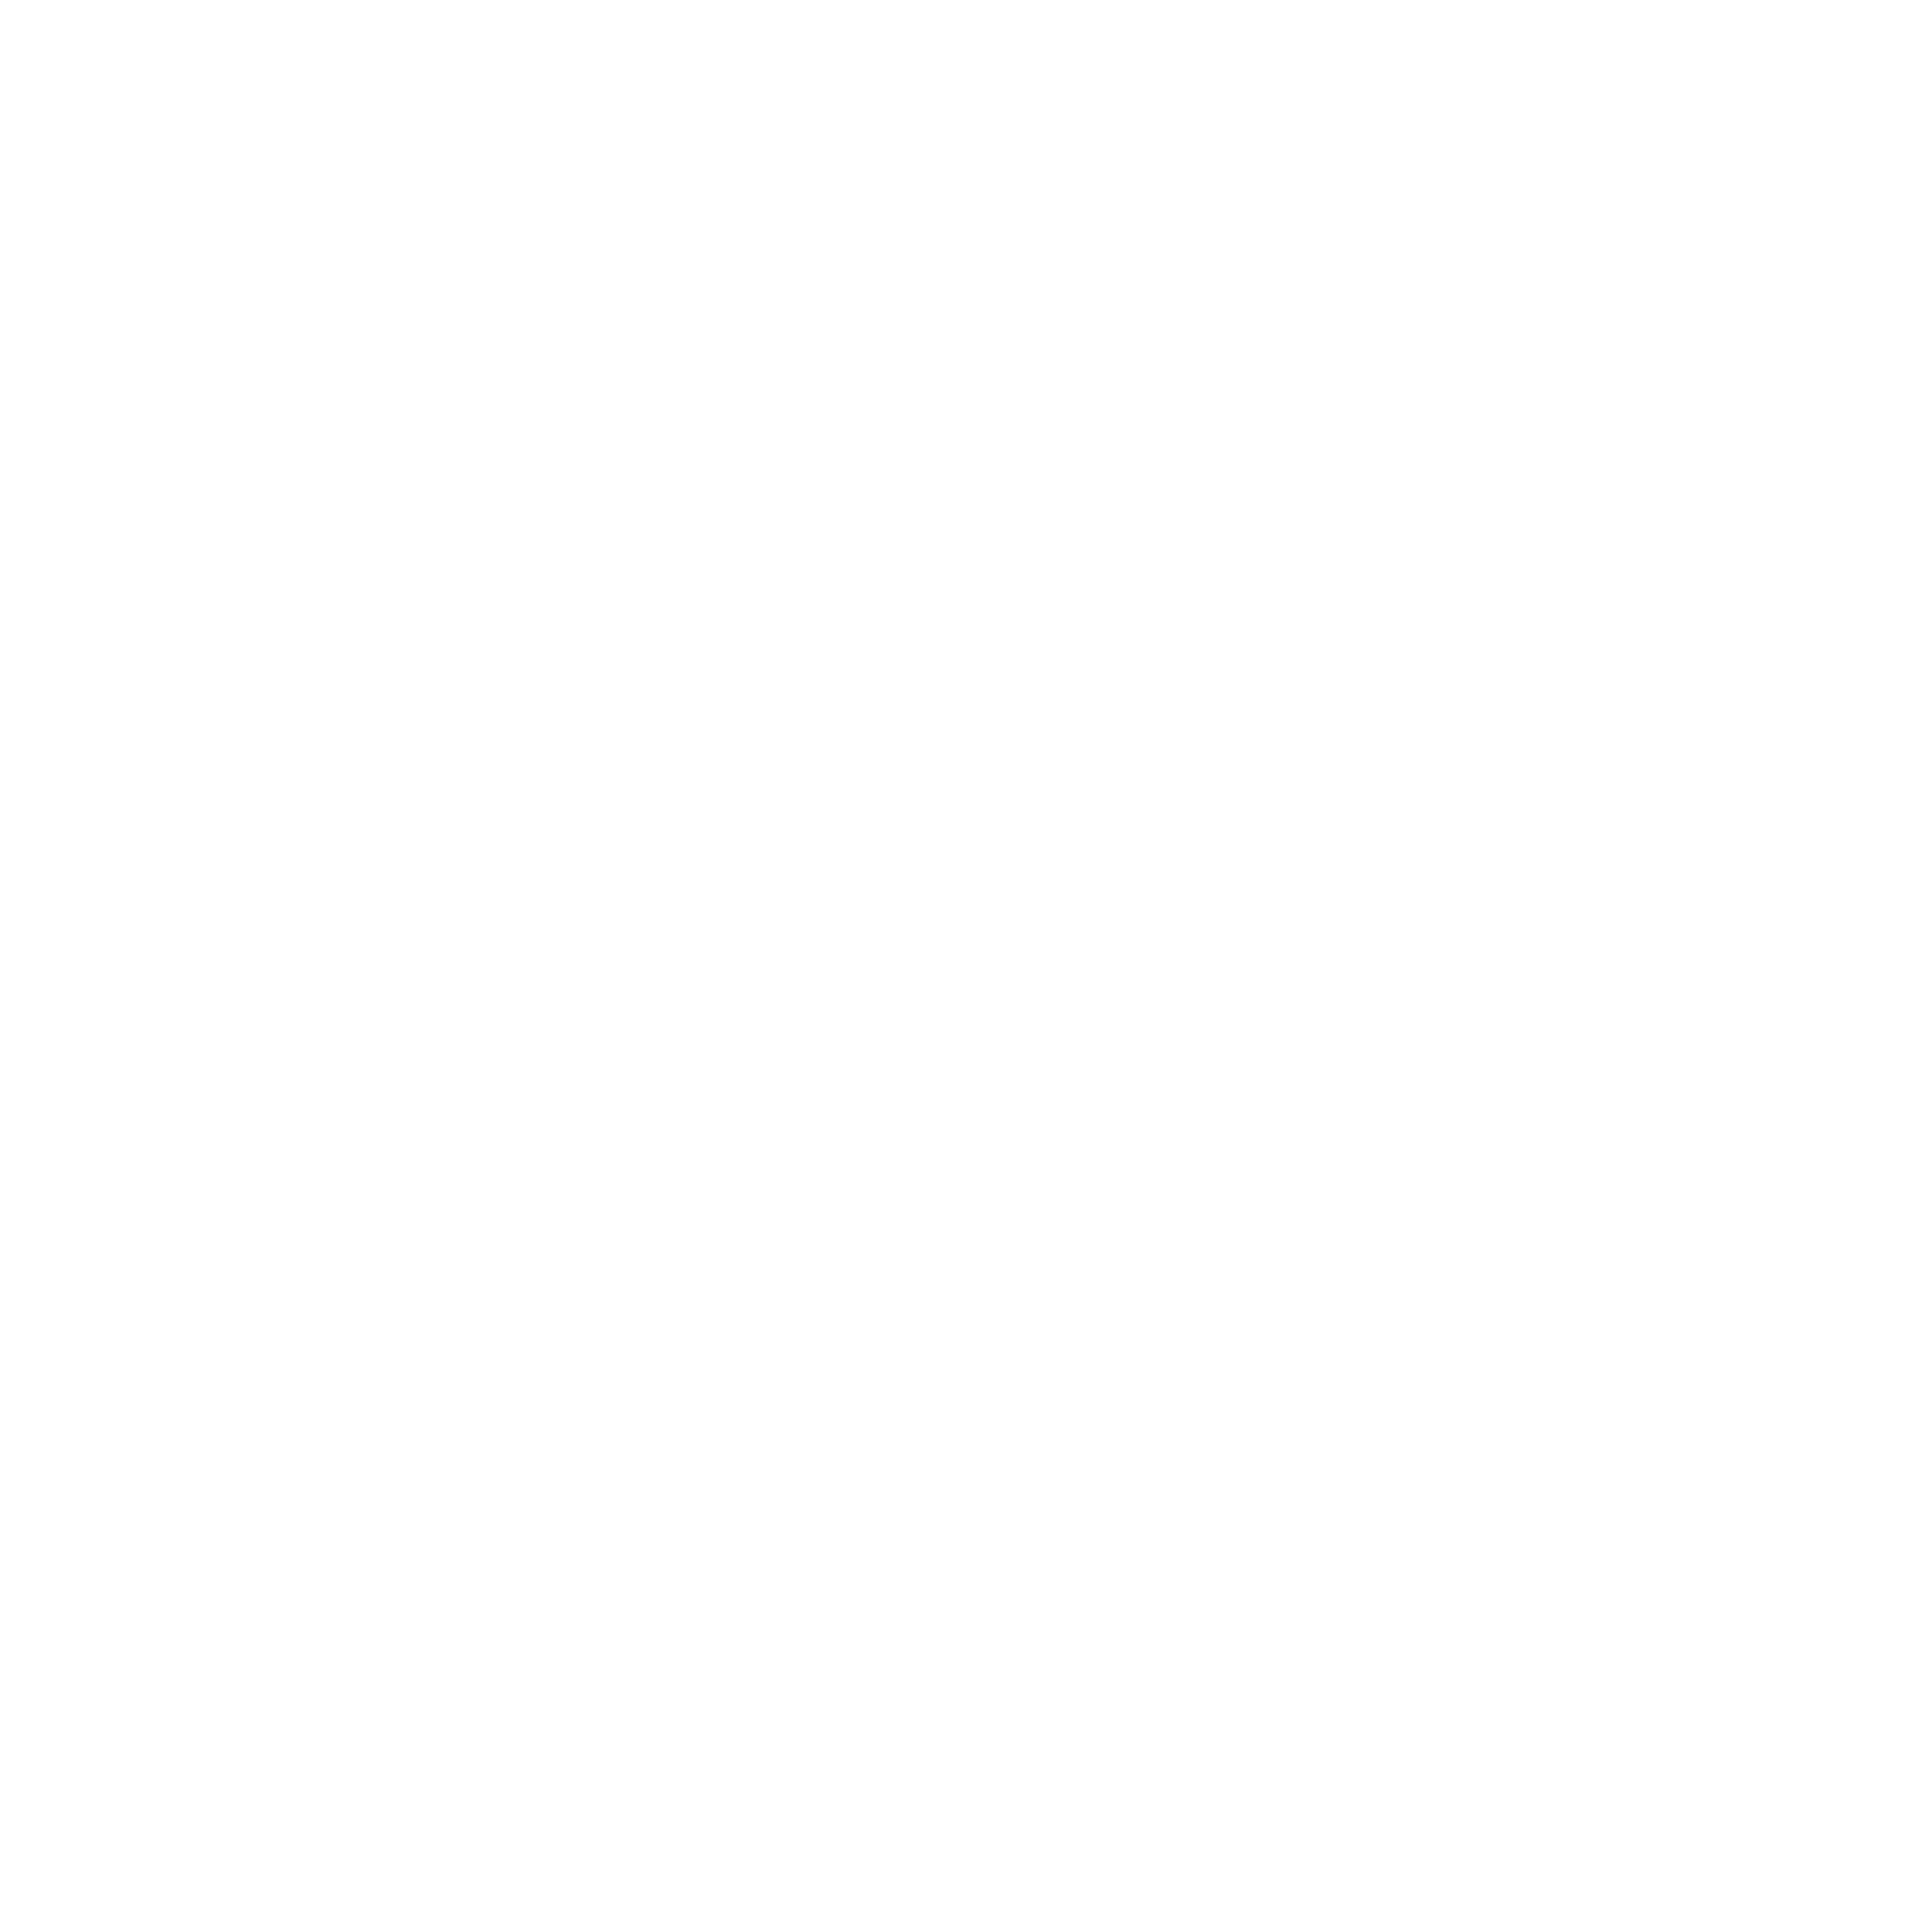 ALTERNATIVE BEACH